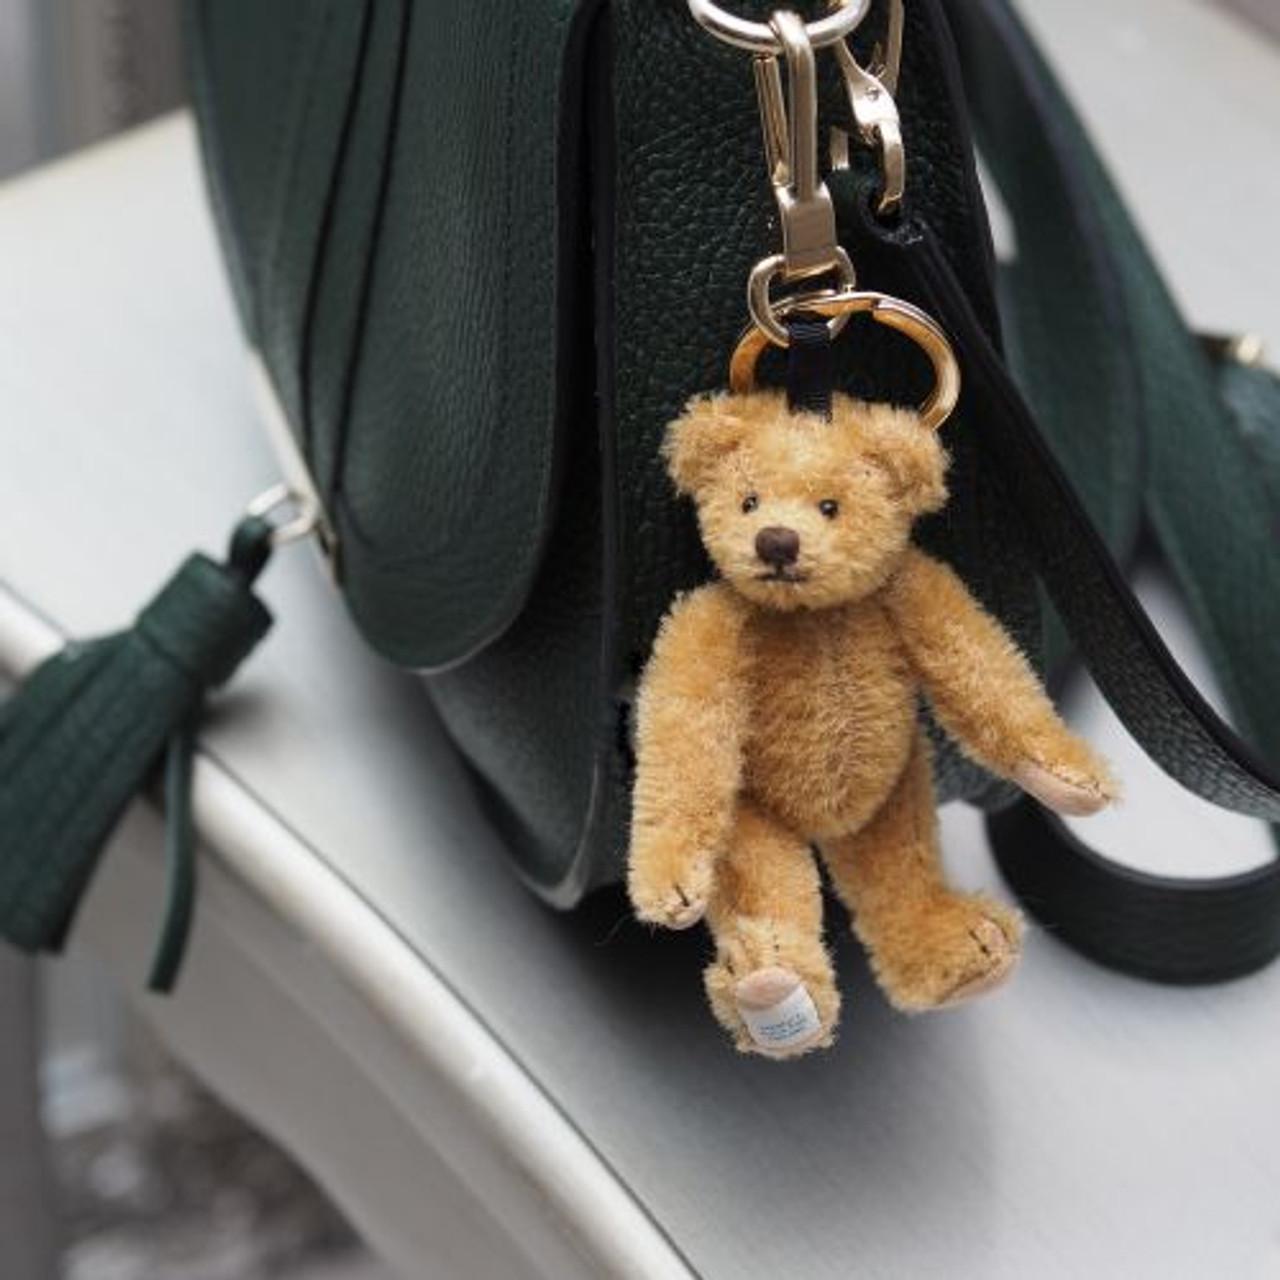 Edward Bear Key Charm, AA Milne Christopher Robin's Teddy Bear, Merrythought UK   Lifestyle